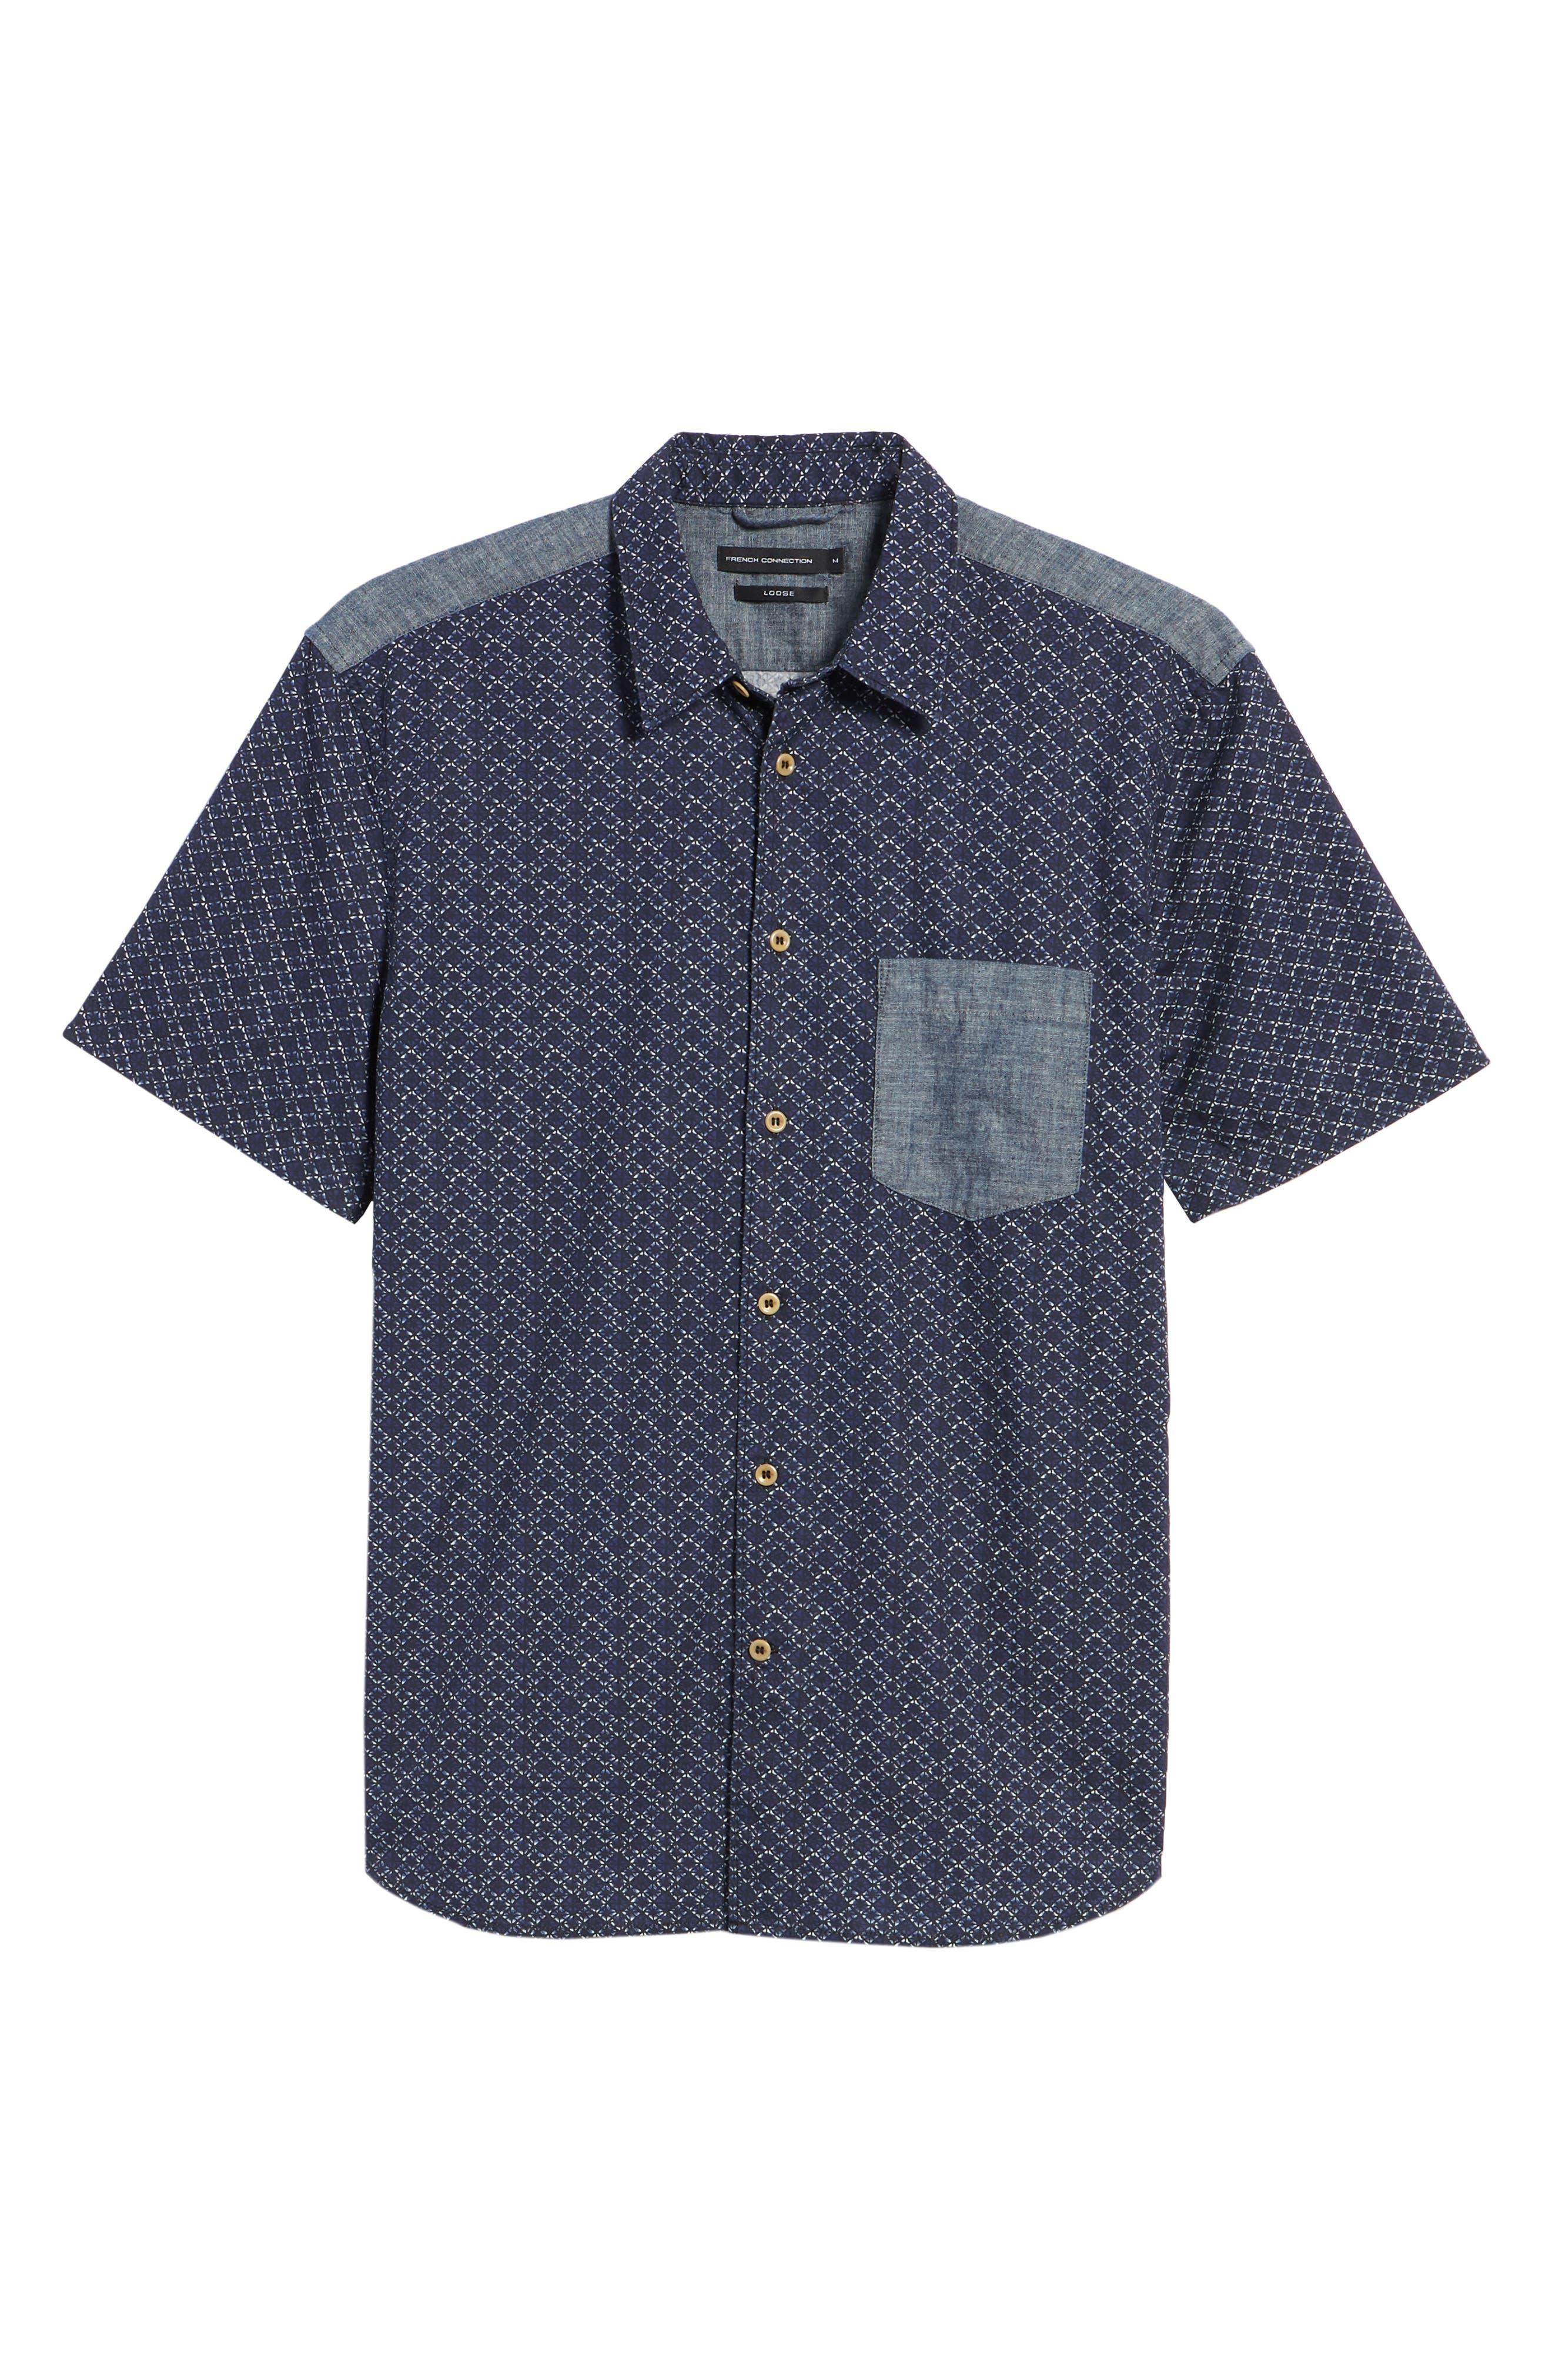 Kast Relaxed Fit Short Sleeve Sport Shirt,                             Alternate thumbnail 6, color,                             410